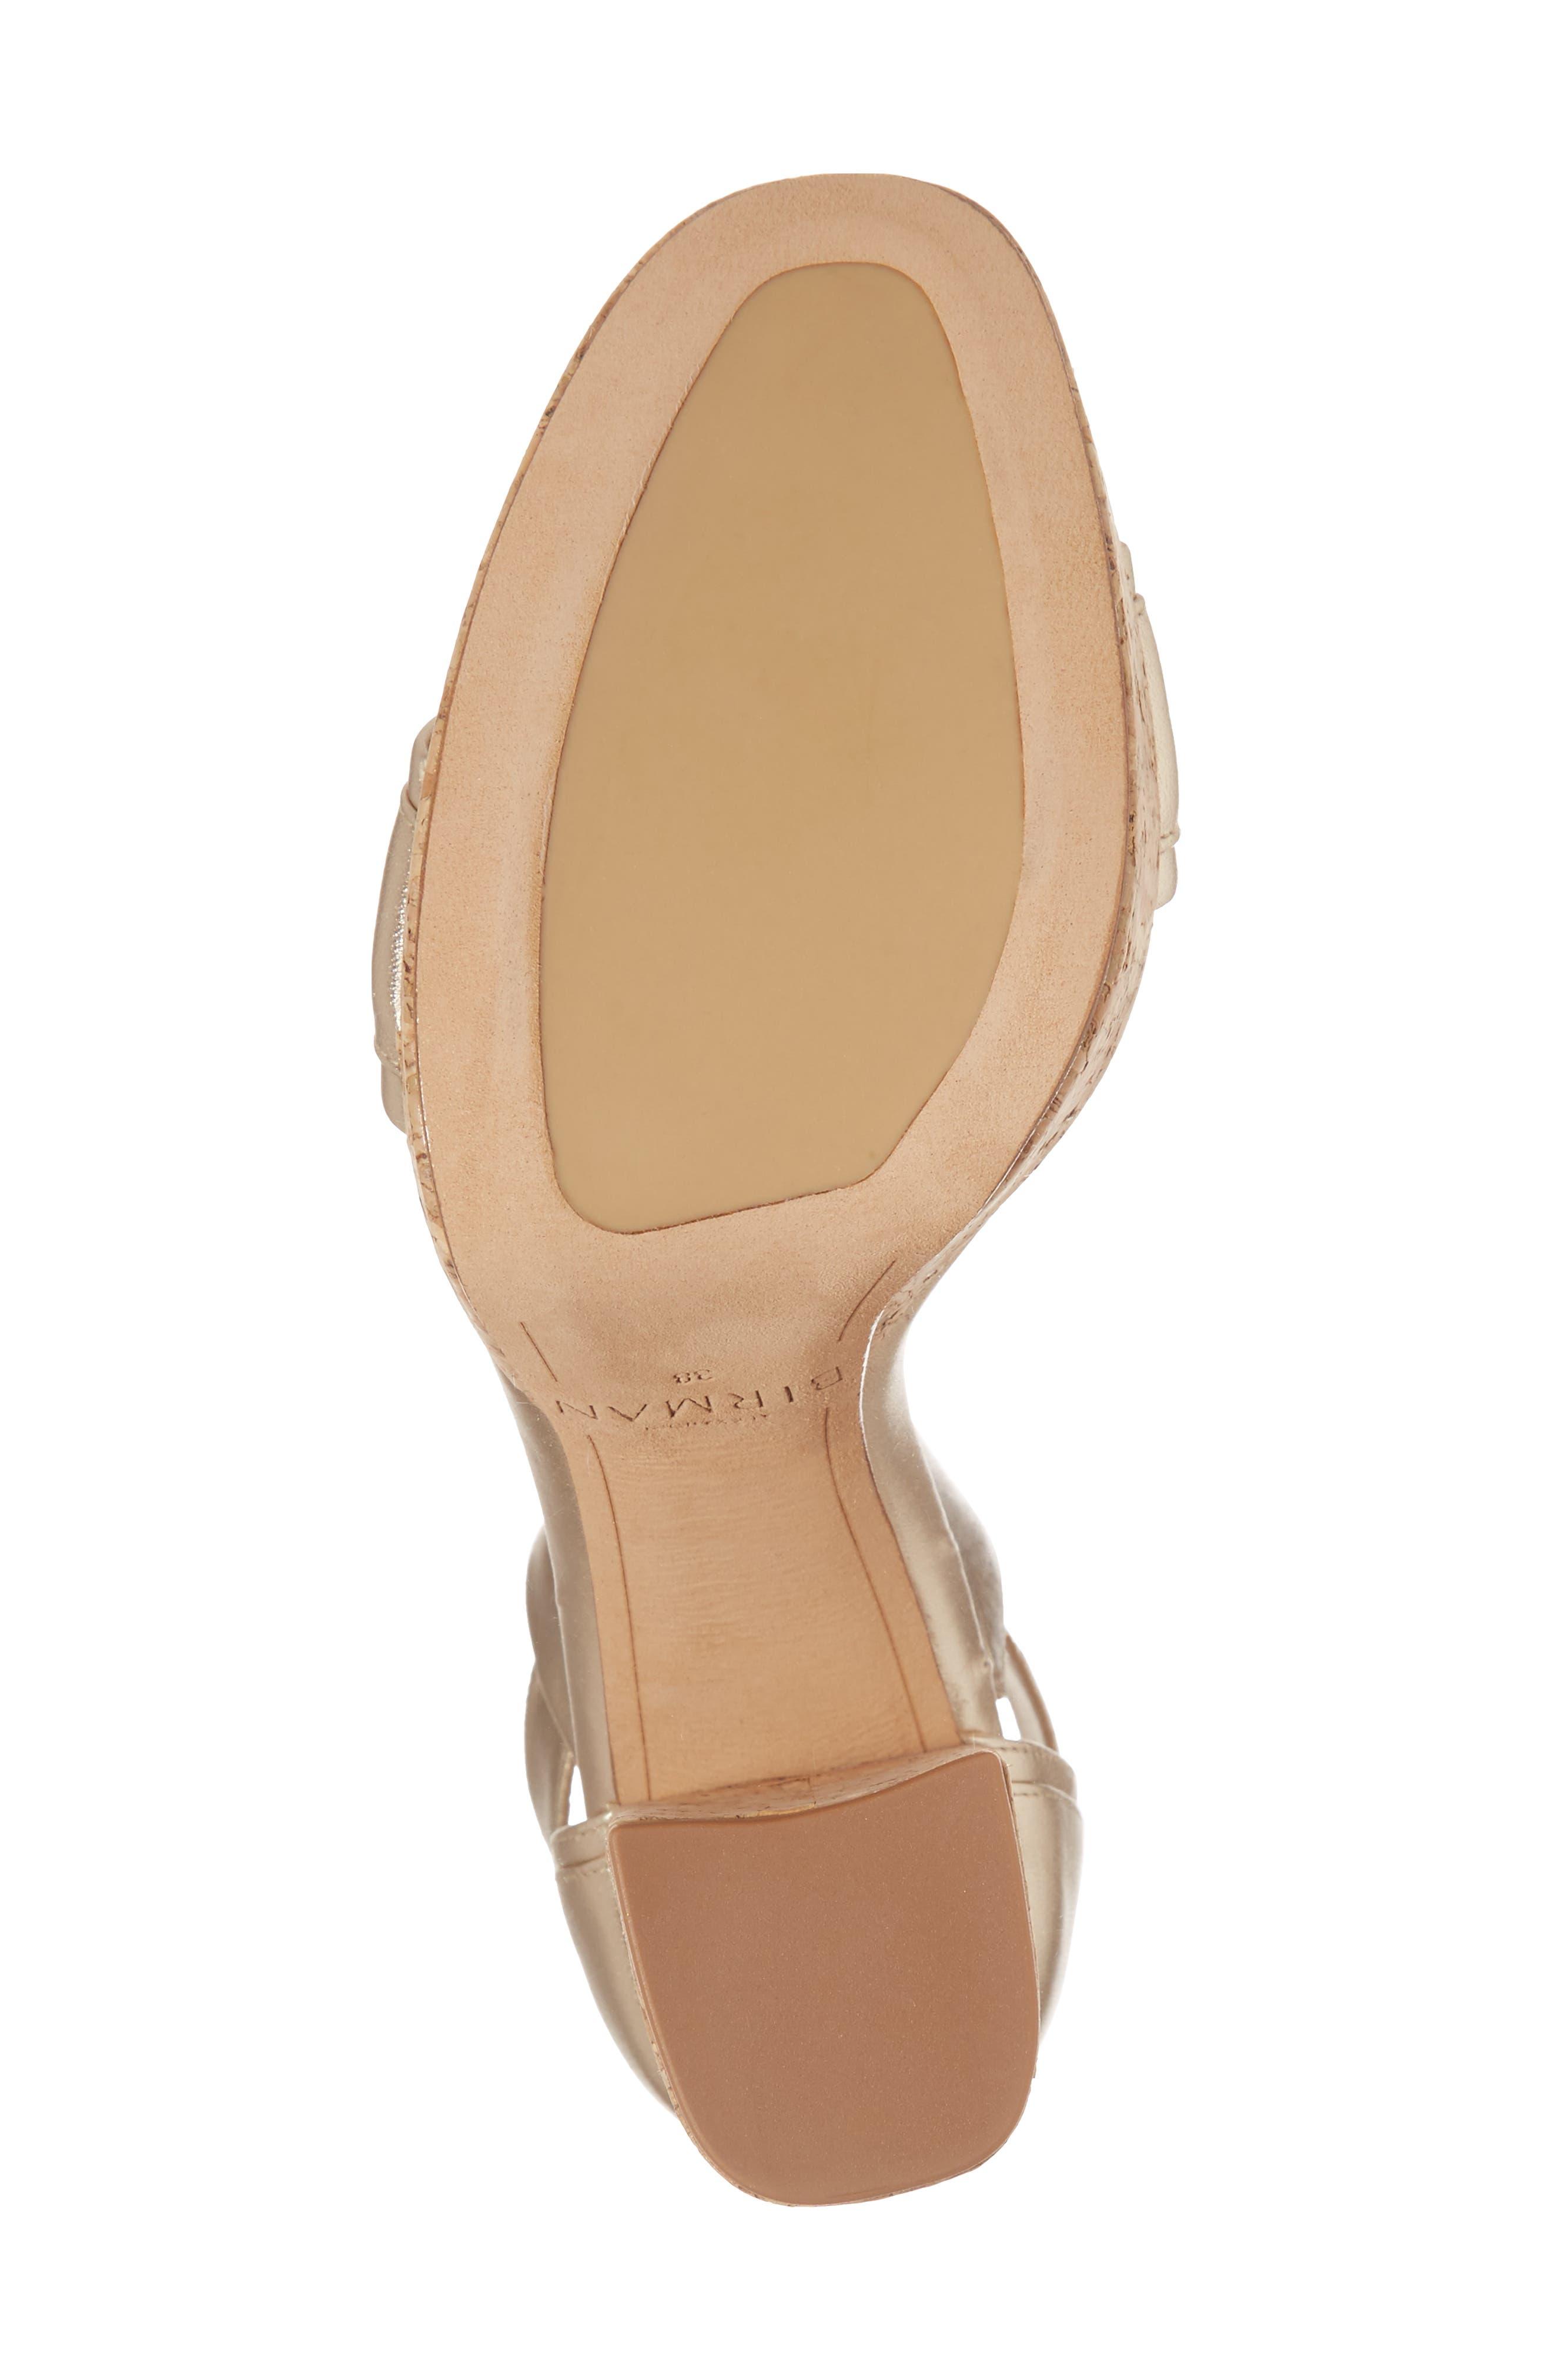 Celine Ankle Tie Platform Sandal,                             Alternate thumbnail 6, color,                             Gold